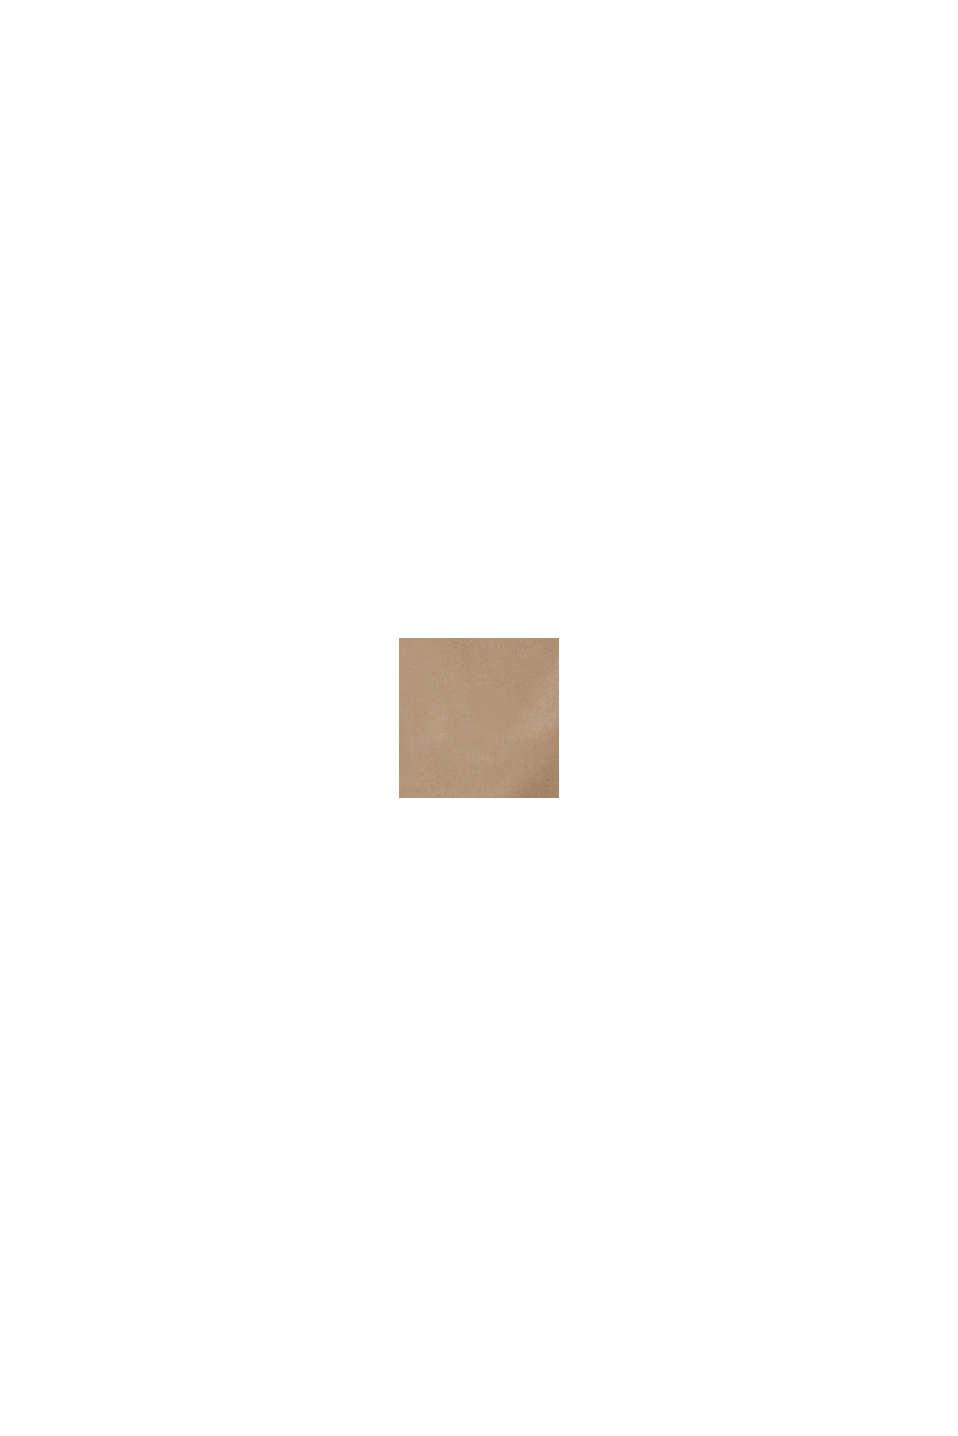 Giacca leggera outdoor in misto cotone, BROWN GREY, swatch